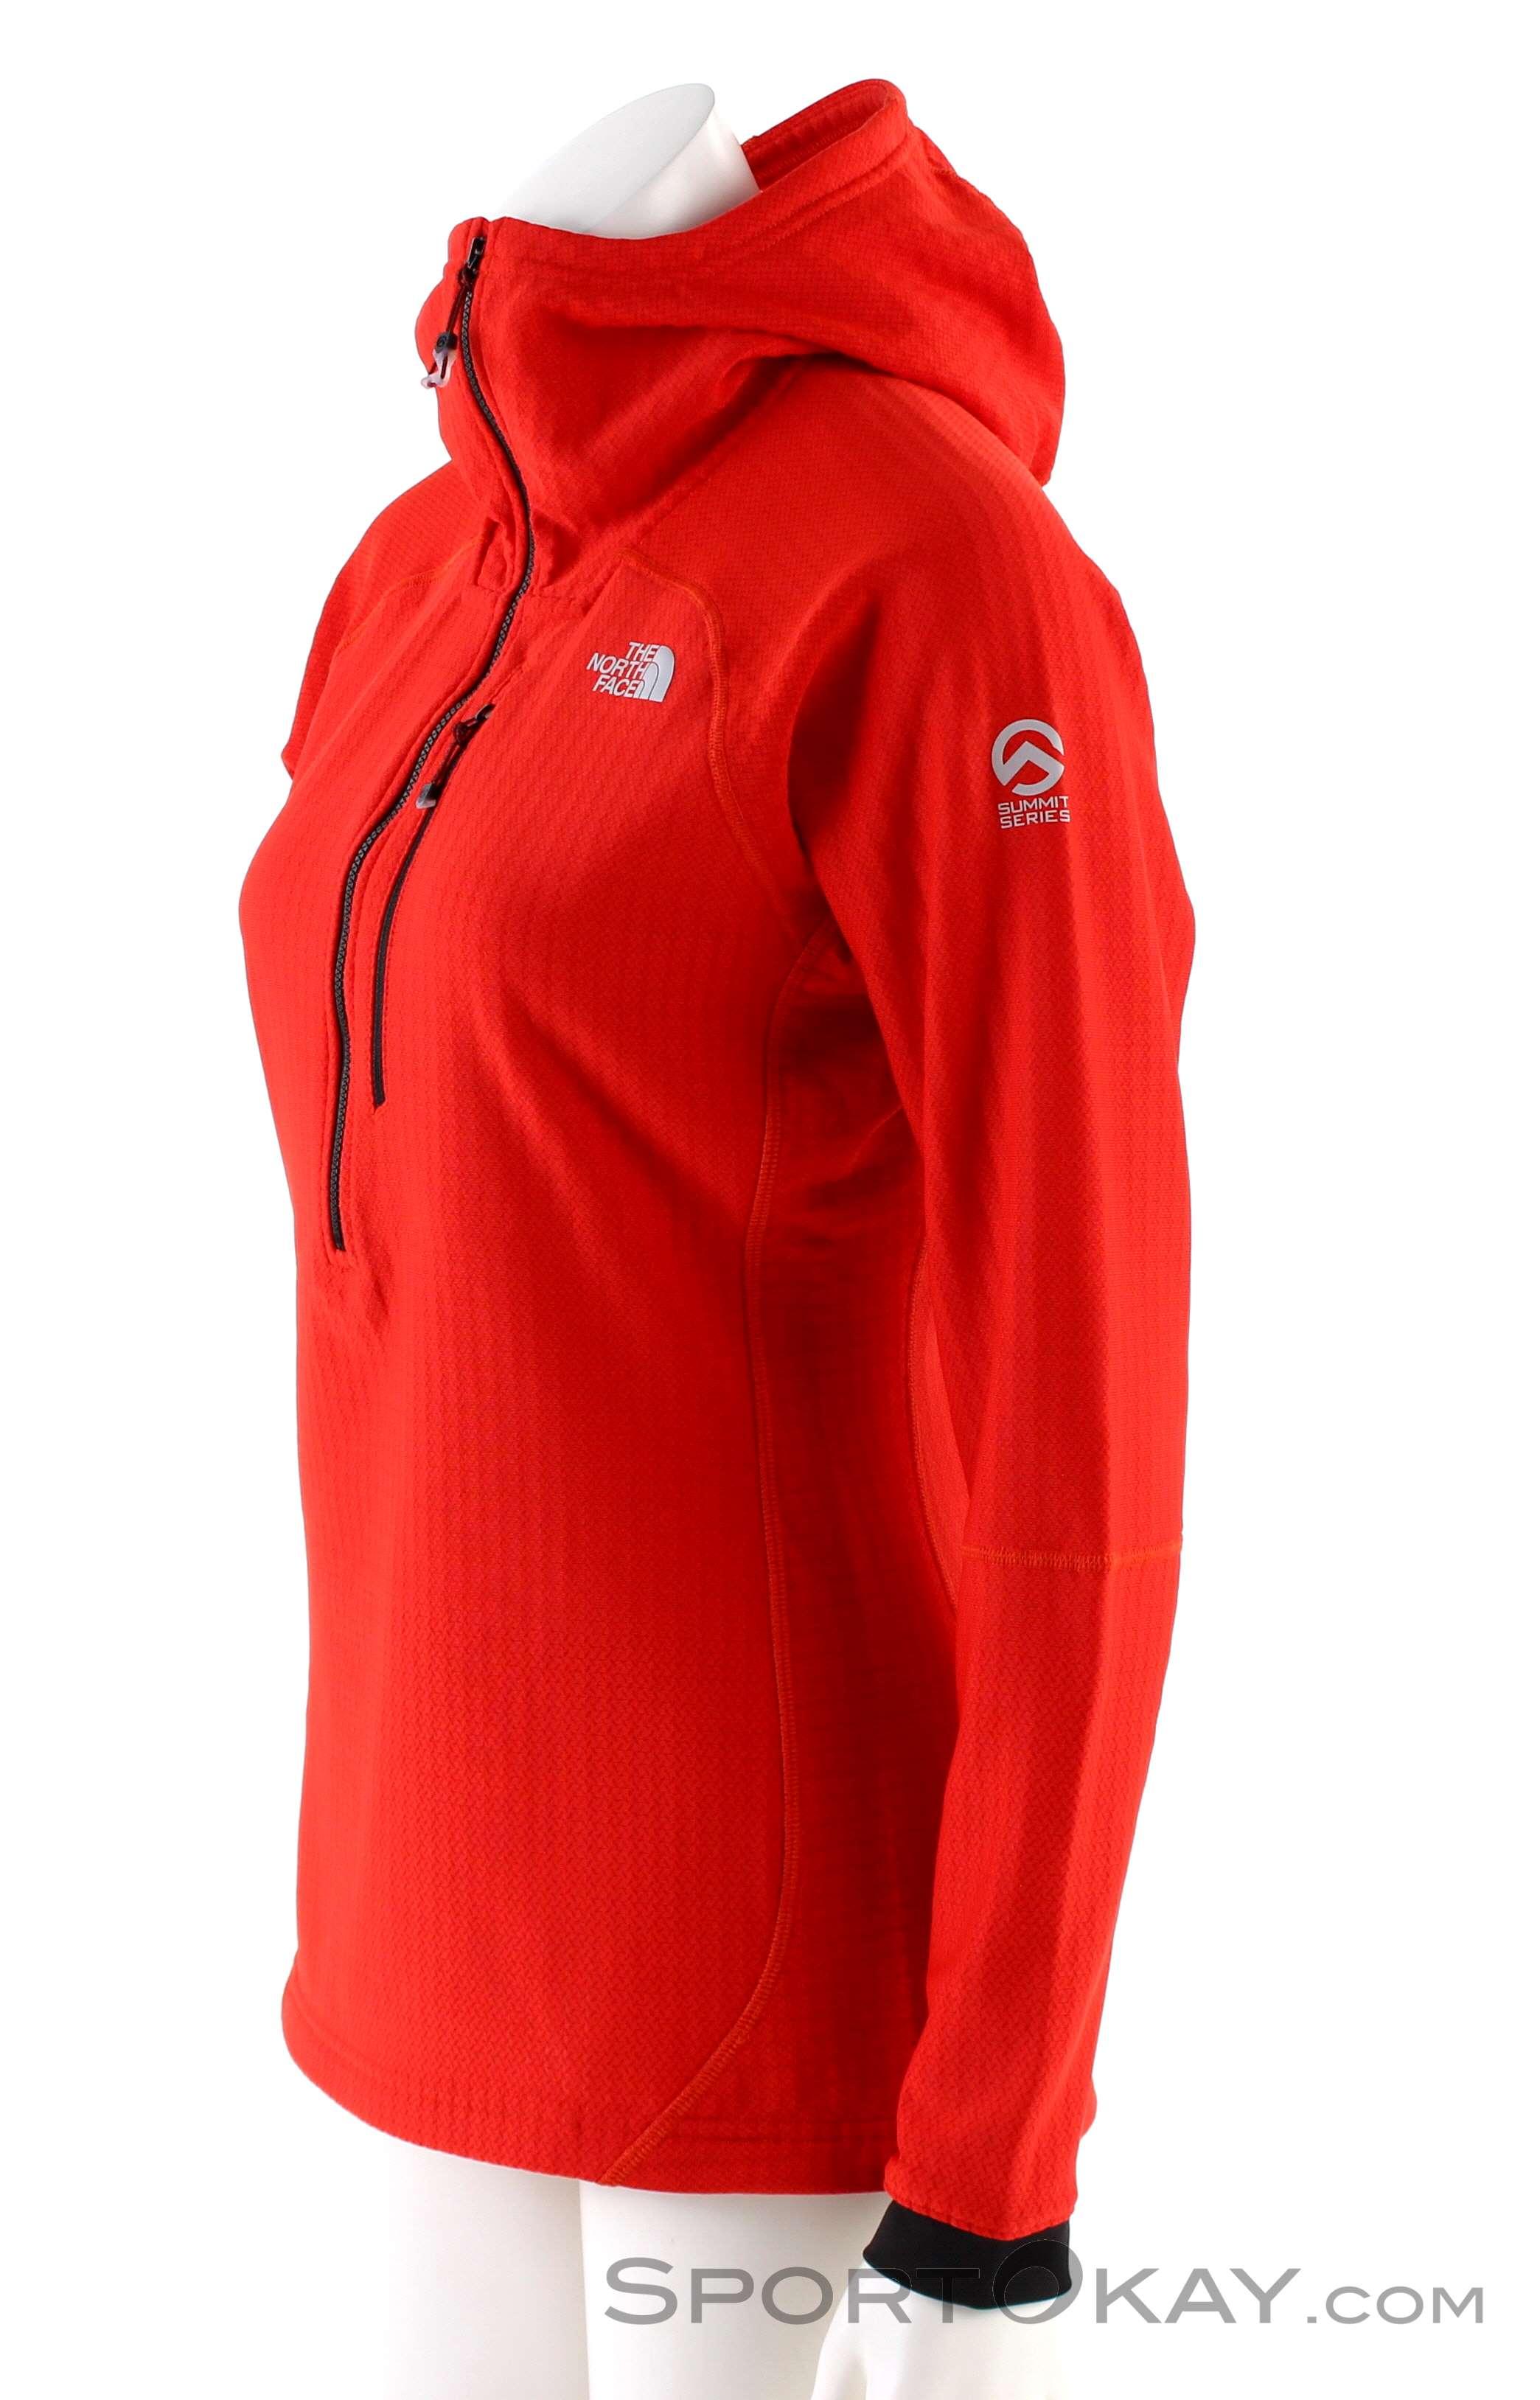 The North Face Summit L2 Fleece HZ Damen Outdoorsweater - Maglie ... 5ec99f436bb6